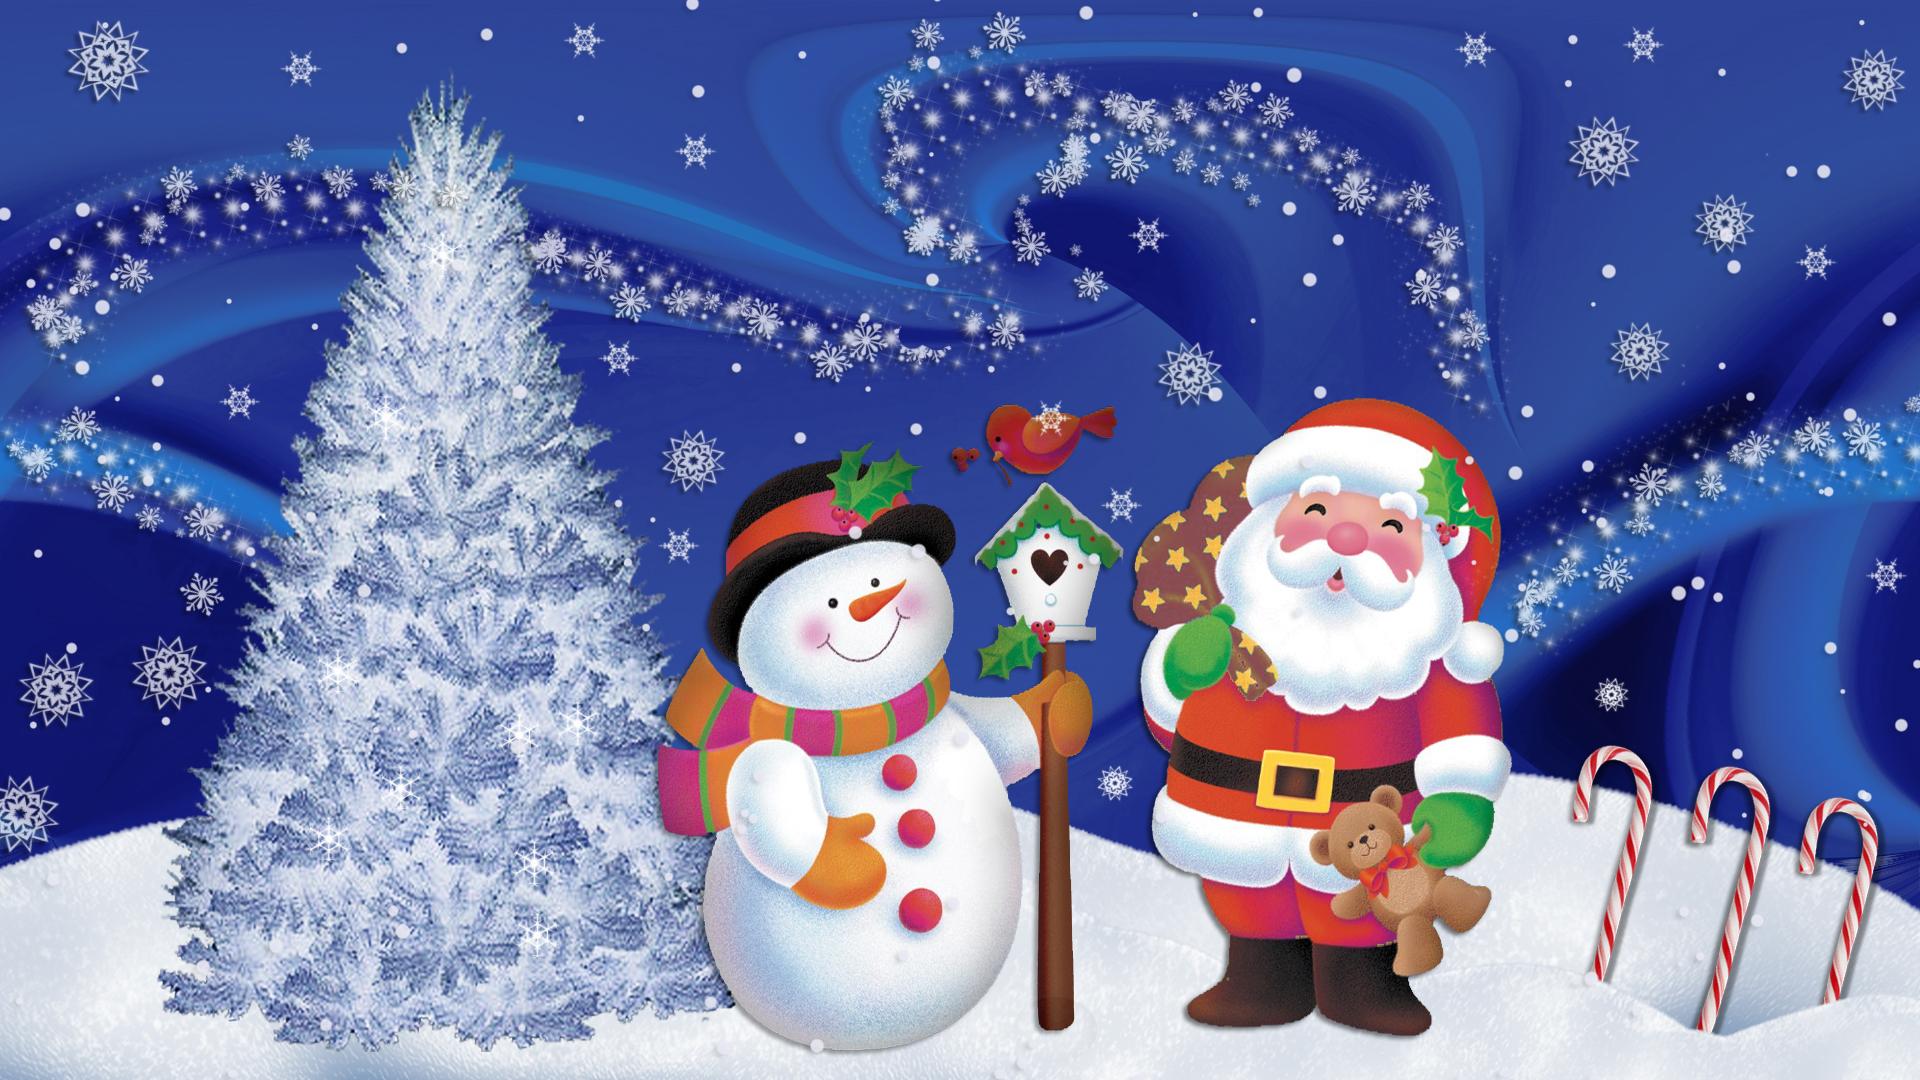 Snowman Christmas Decoration Wallpaper